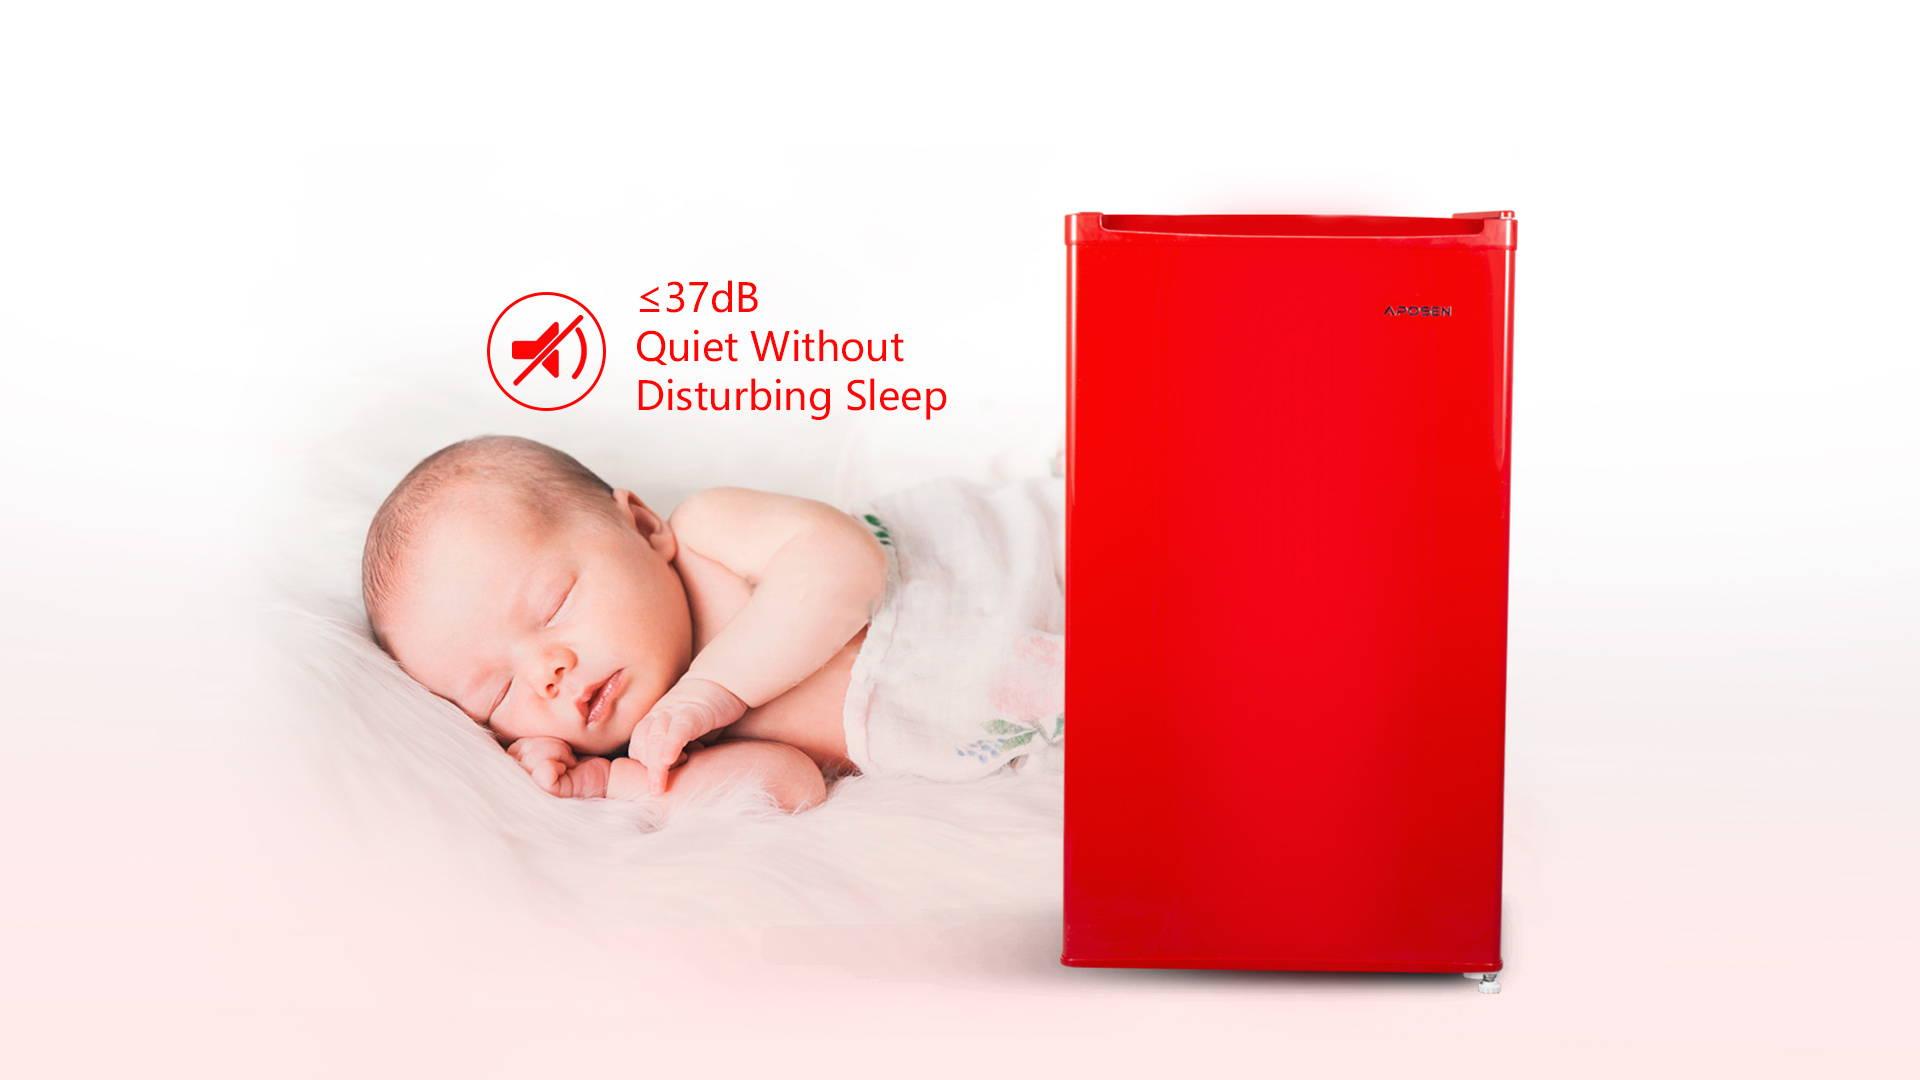 APOSEN New 3.2CU Red Refrigerator—AR32